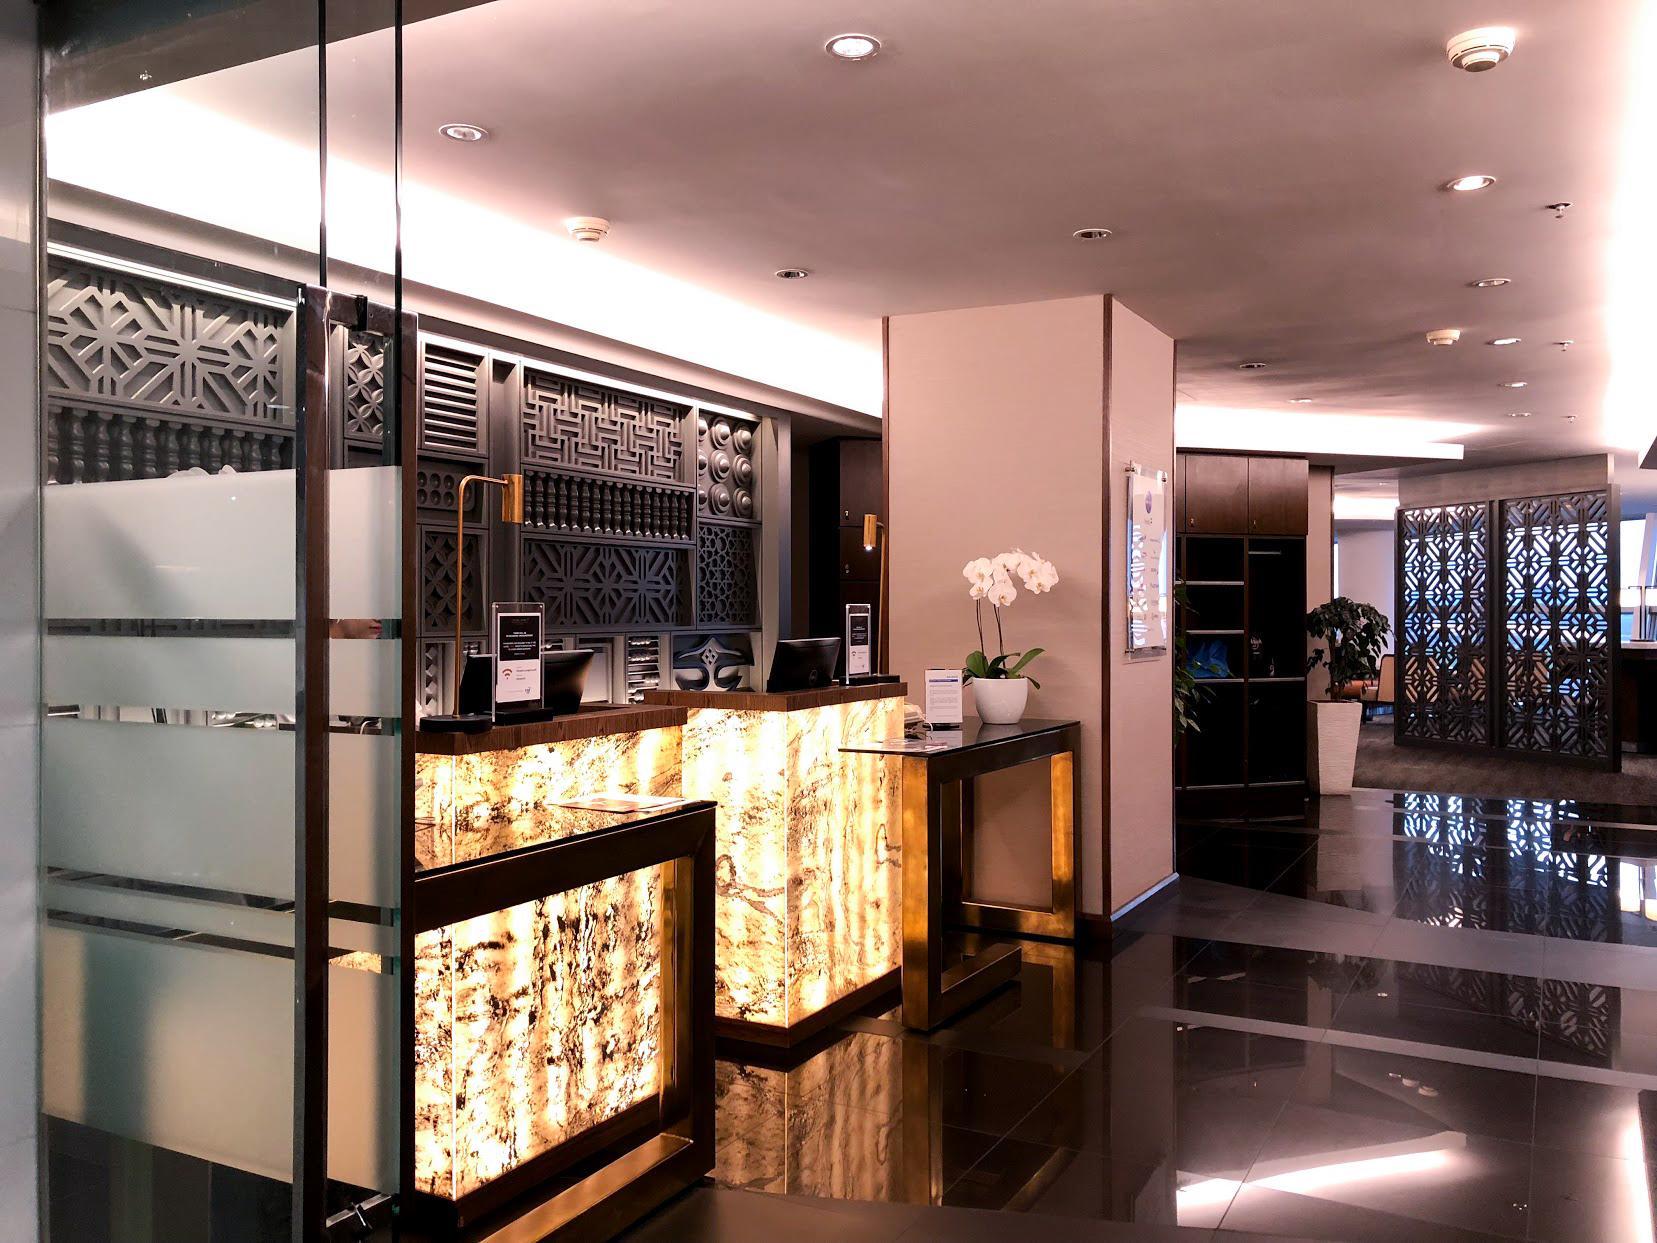 Malaysia Airlines Domestic Golden Lounge Kuala Lumpur